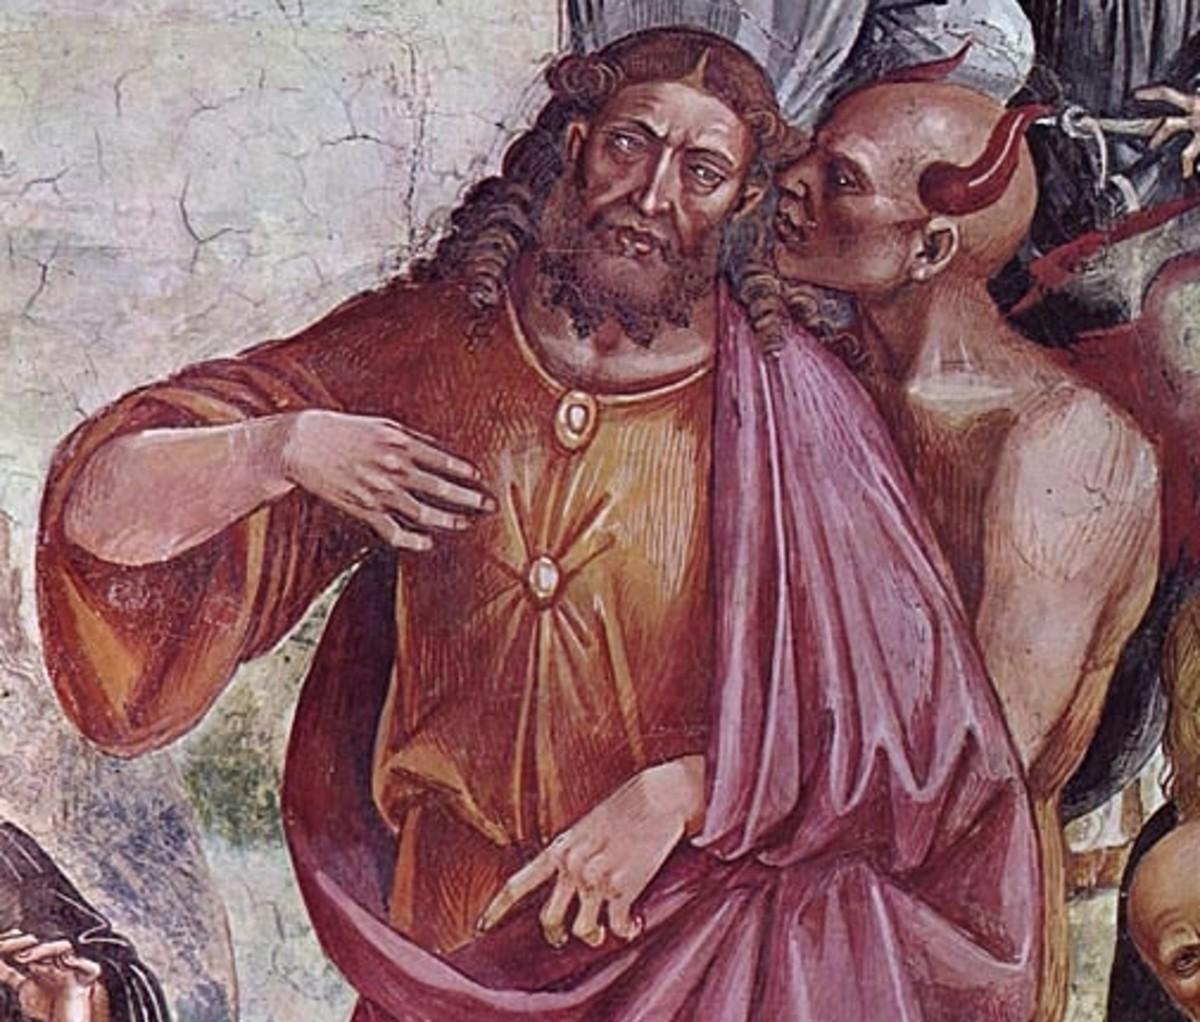 Antichrist and Satan